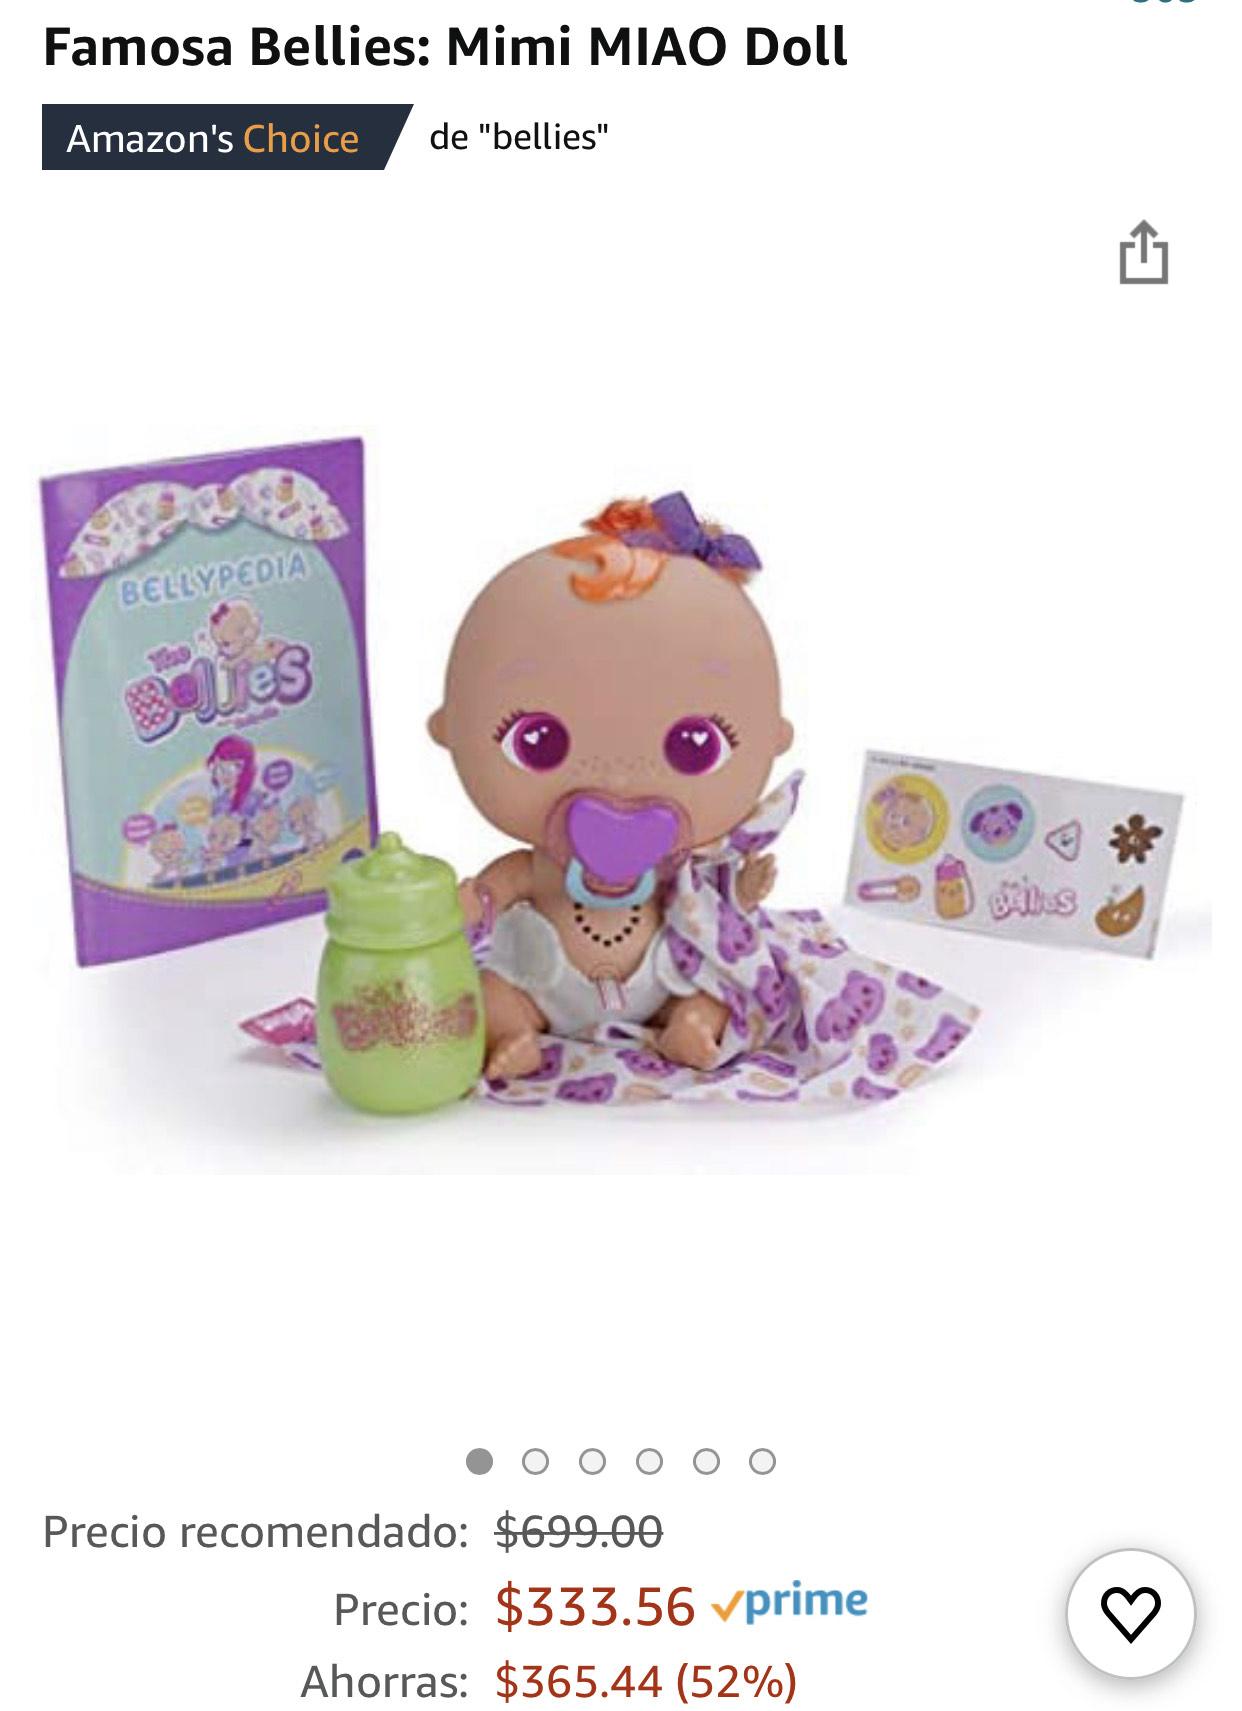 Amazon: Famosa Bellies: Mimi MIAO Doll